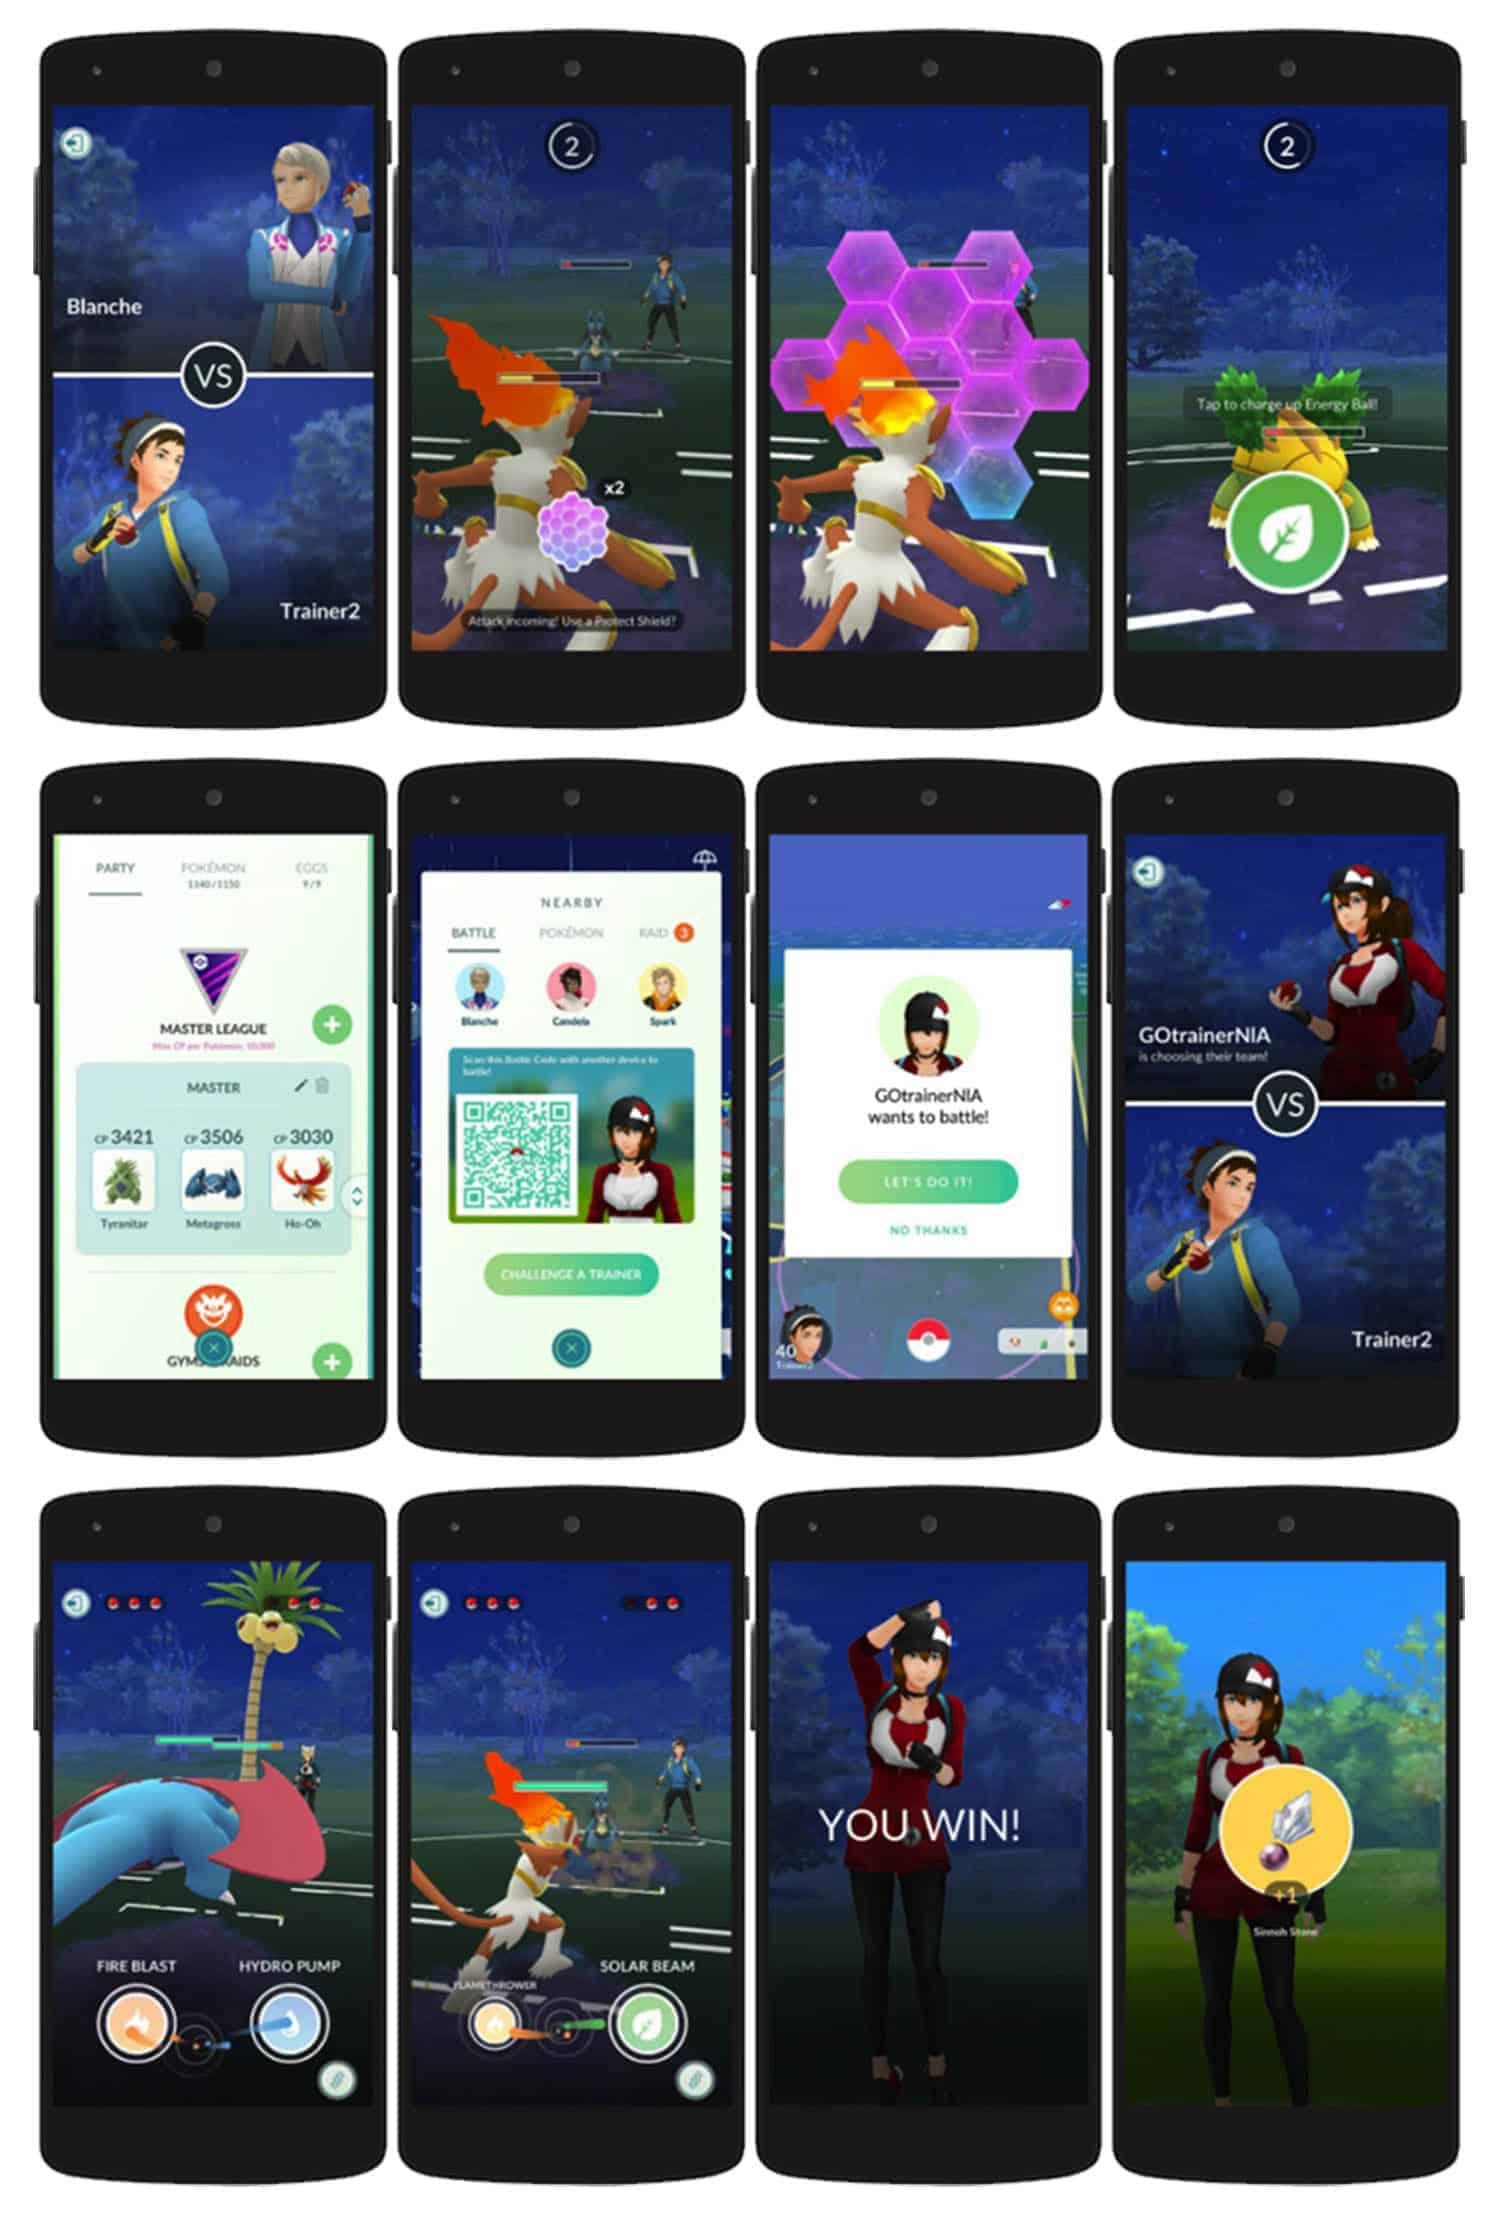 PokémonGoPvP